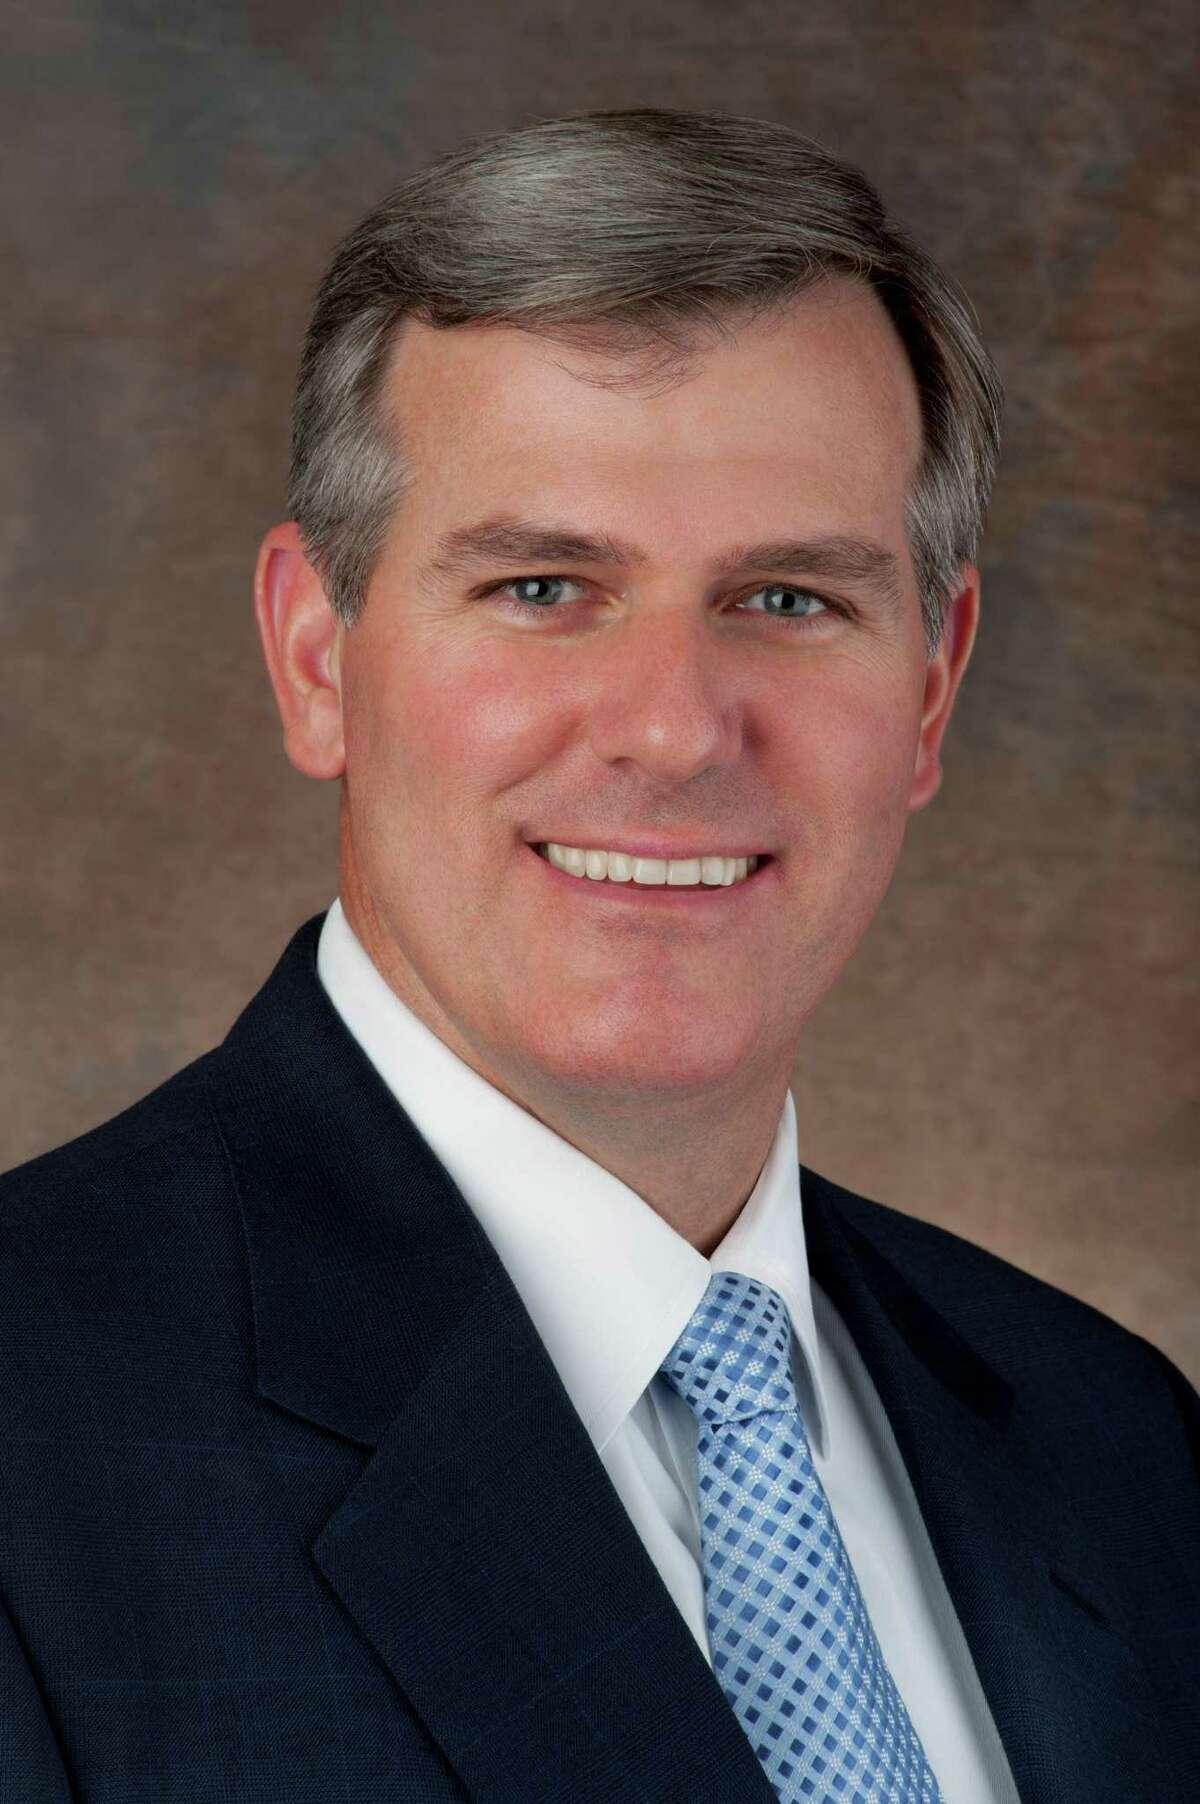 Galveston businessman Todd Sullivan serves on the board of trustees of the Galveston Wharves.